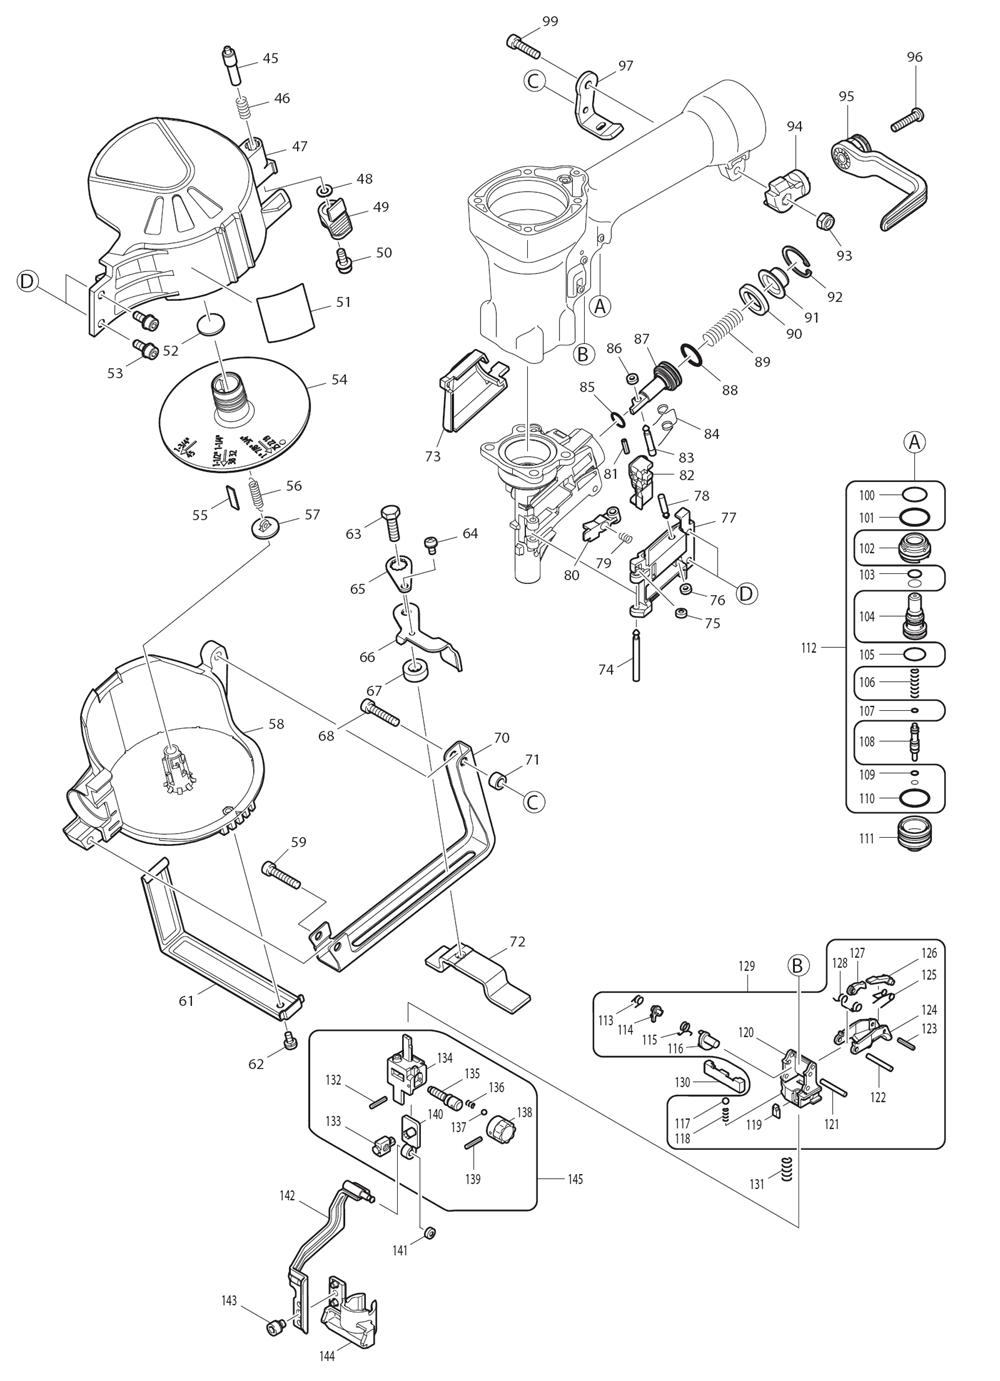 AN450H-T1-Makita-PB-1Break Down